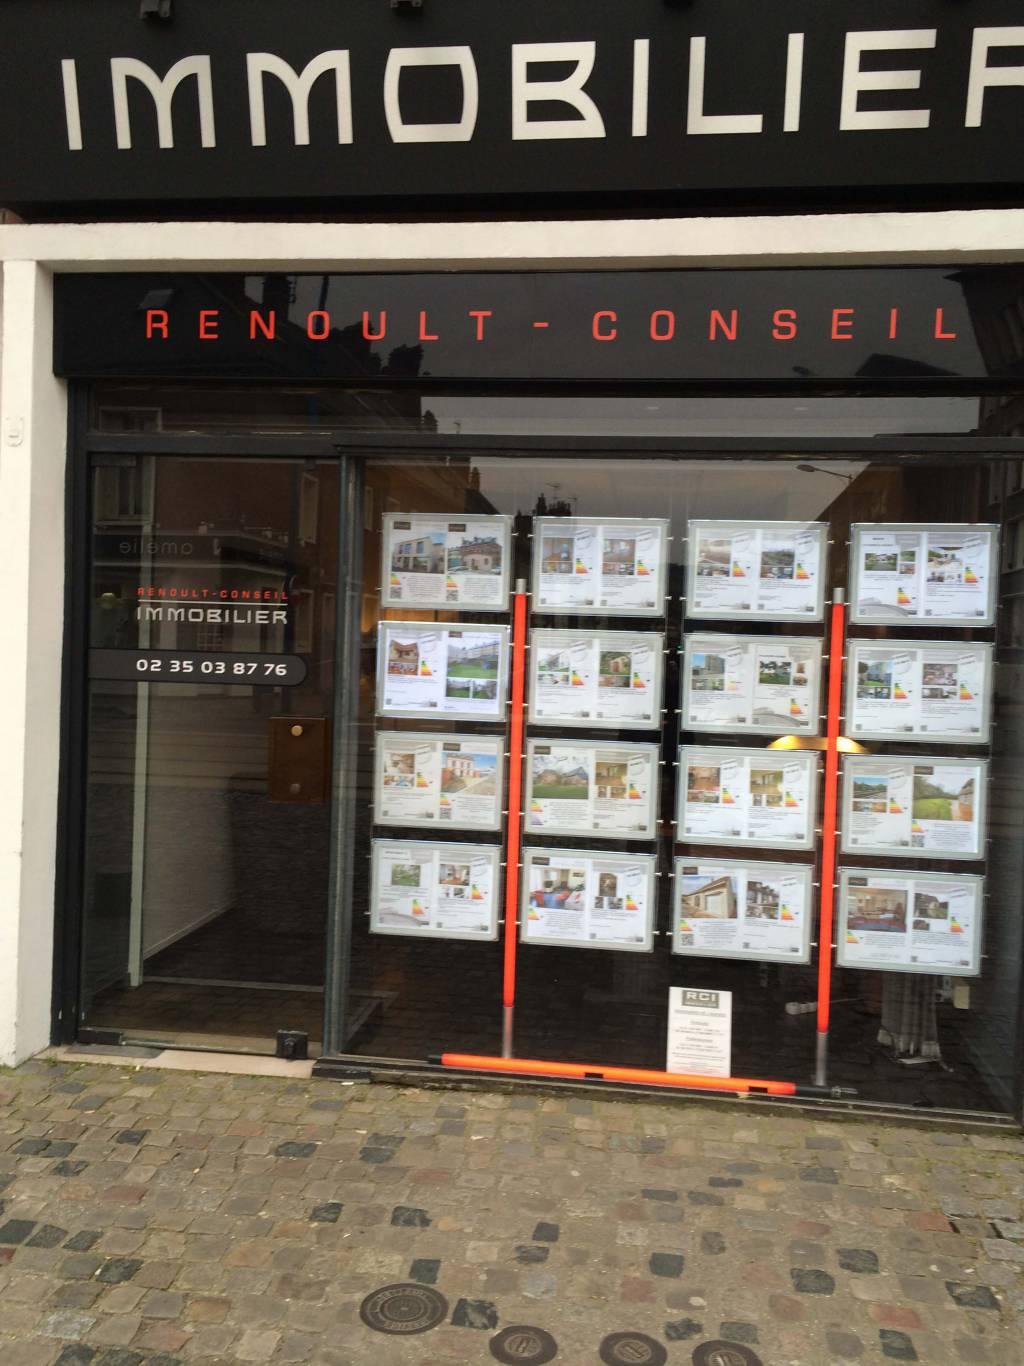 Renoult Conseil Immobilier